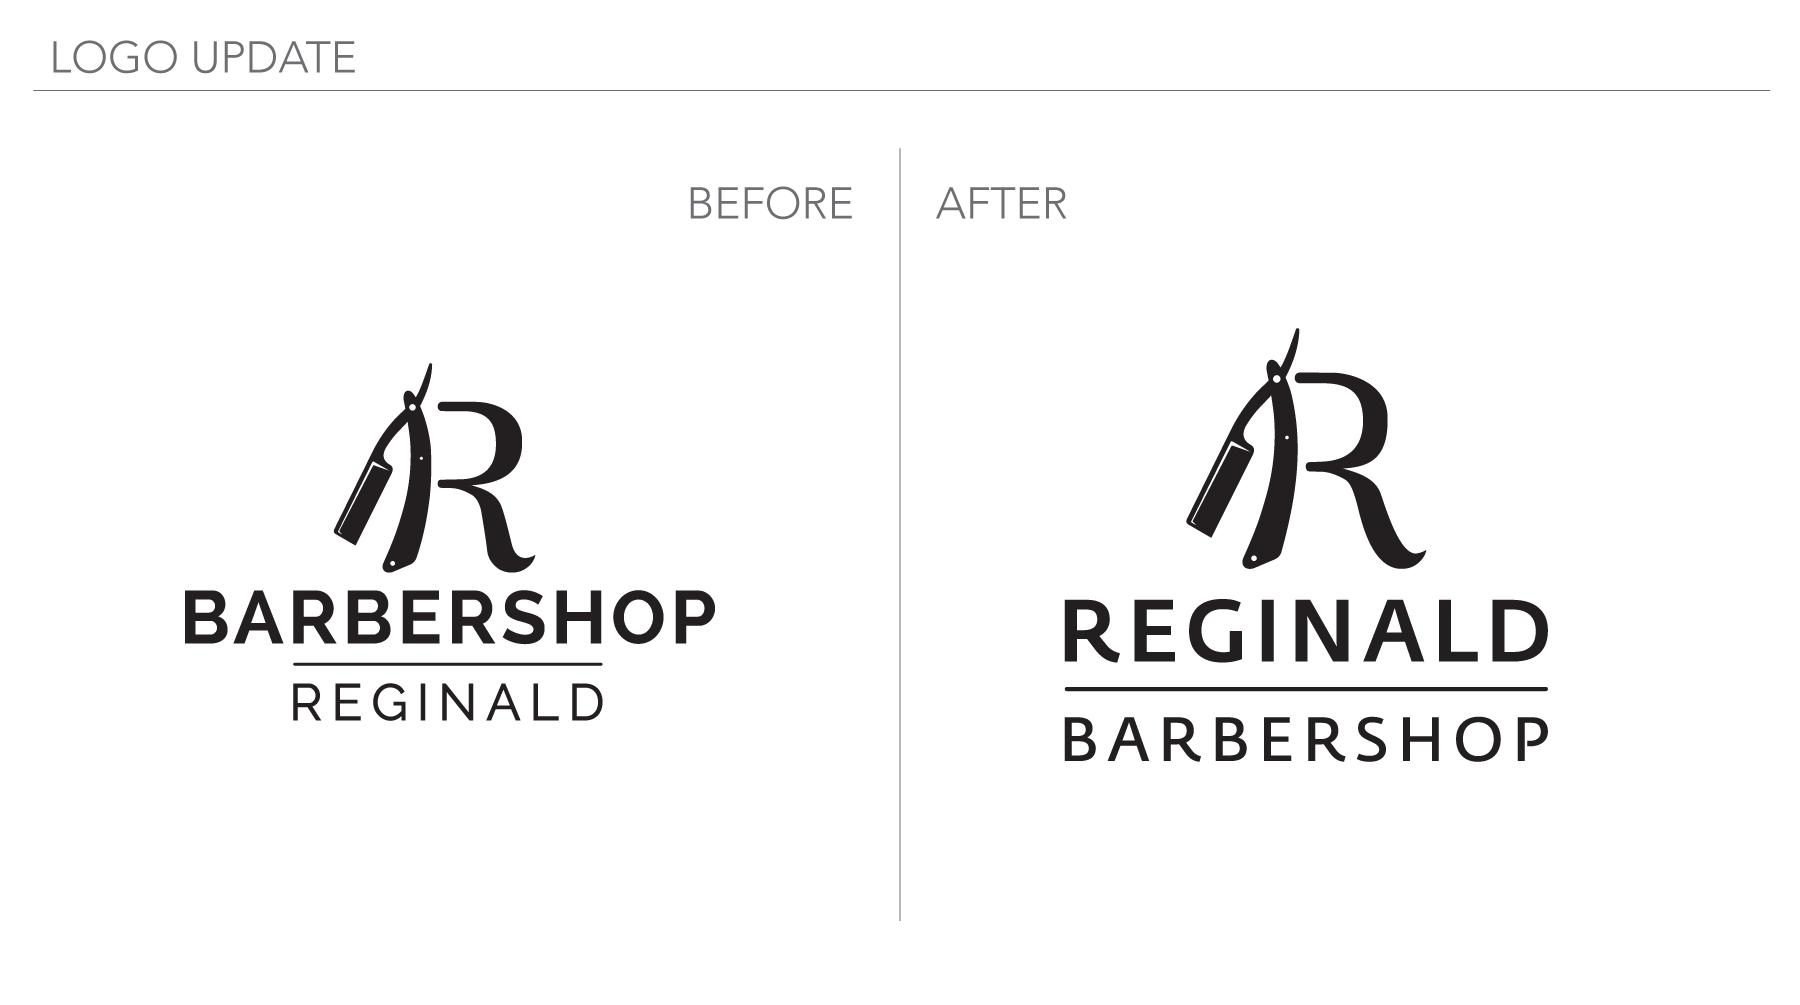 Reginald Barbershop Logo Update